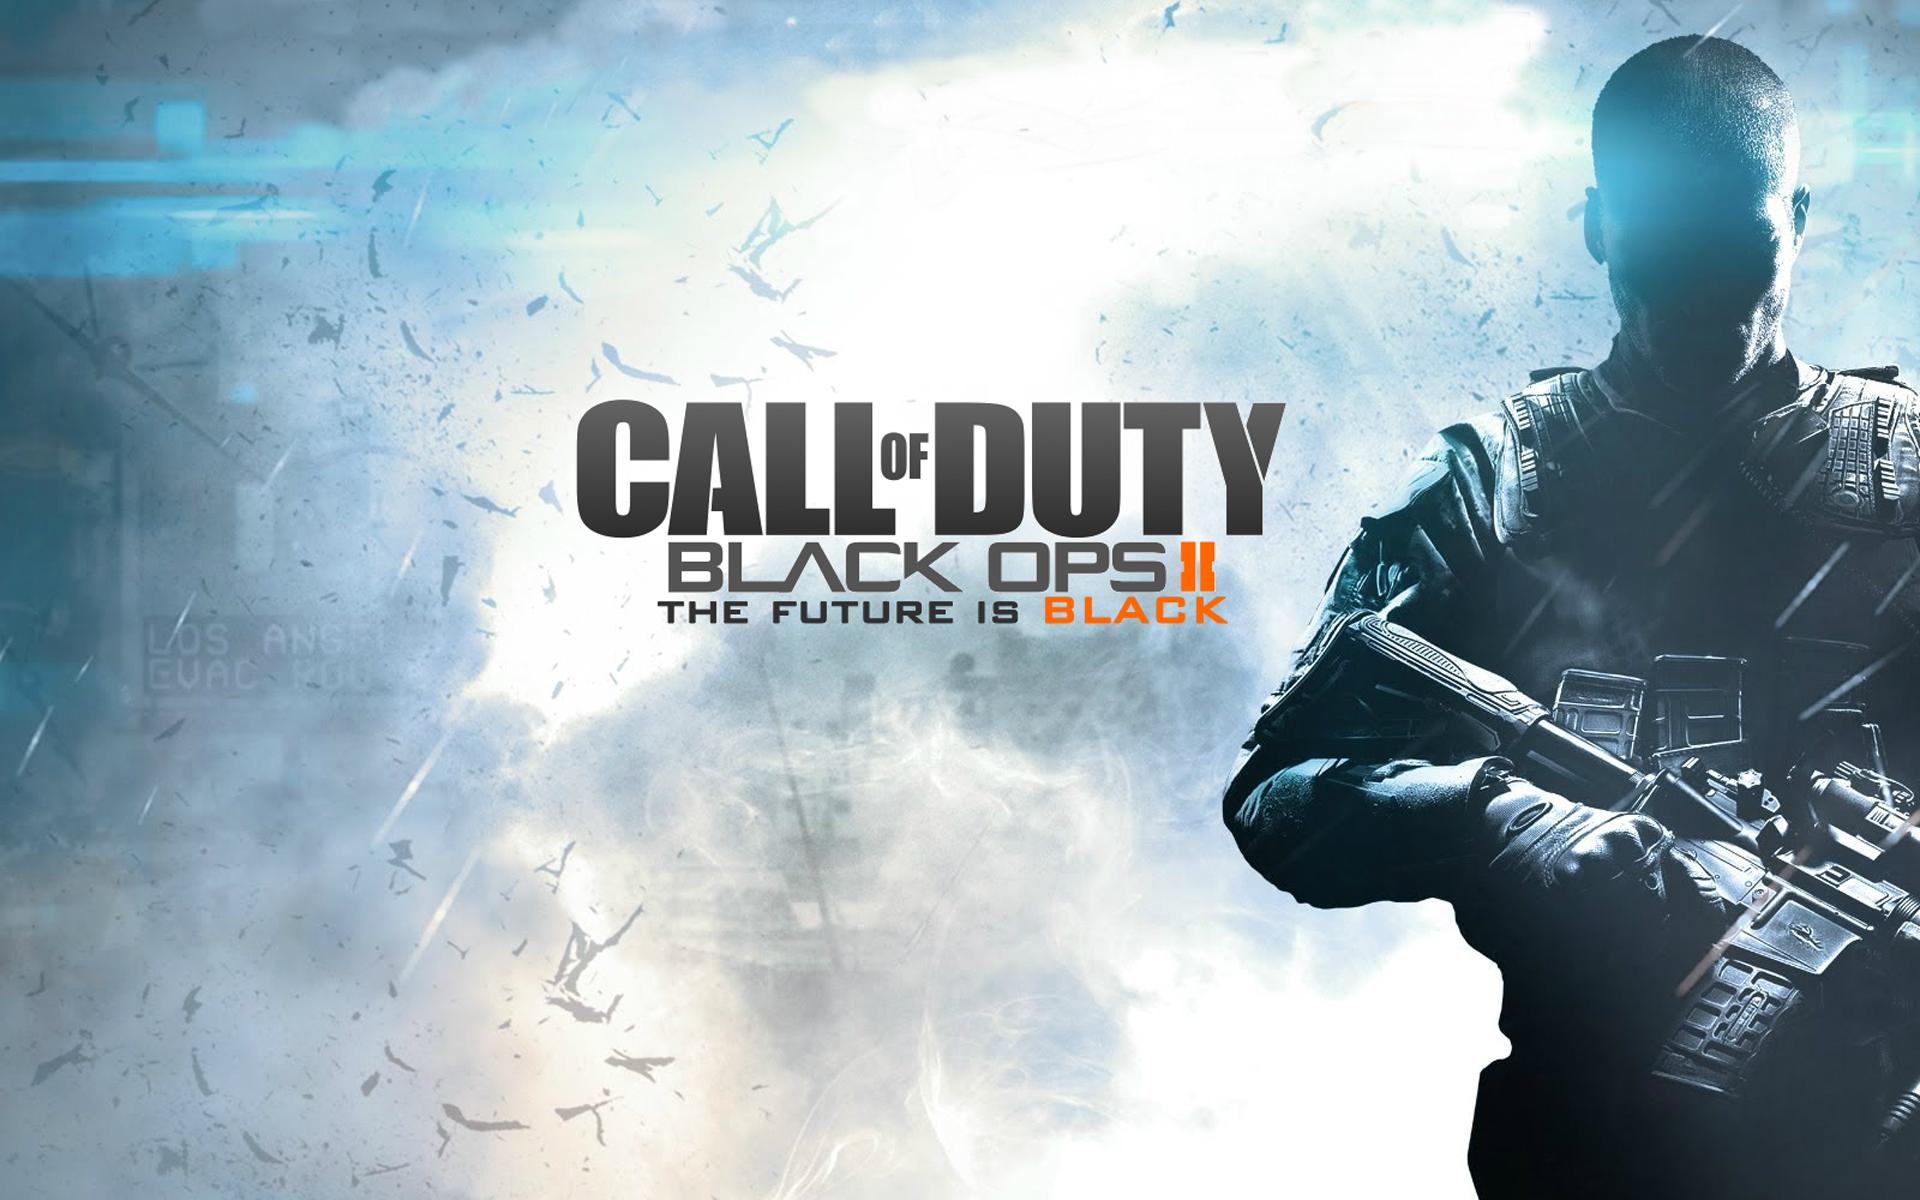 Call Of Duty Black Ops 2 Wallpaper 5 Wallpapersbq